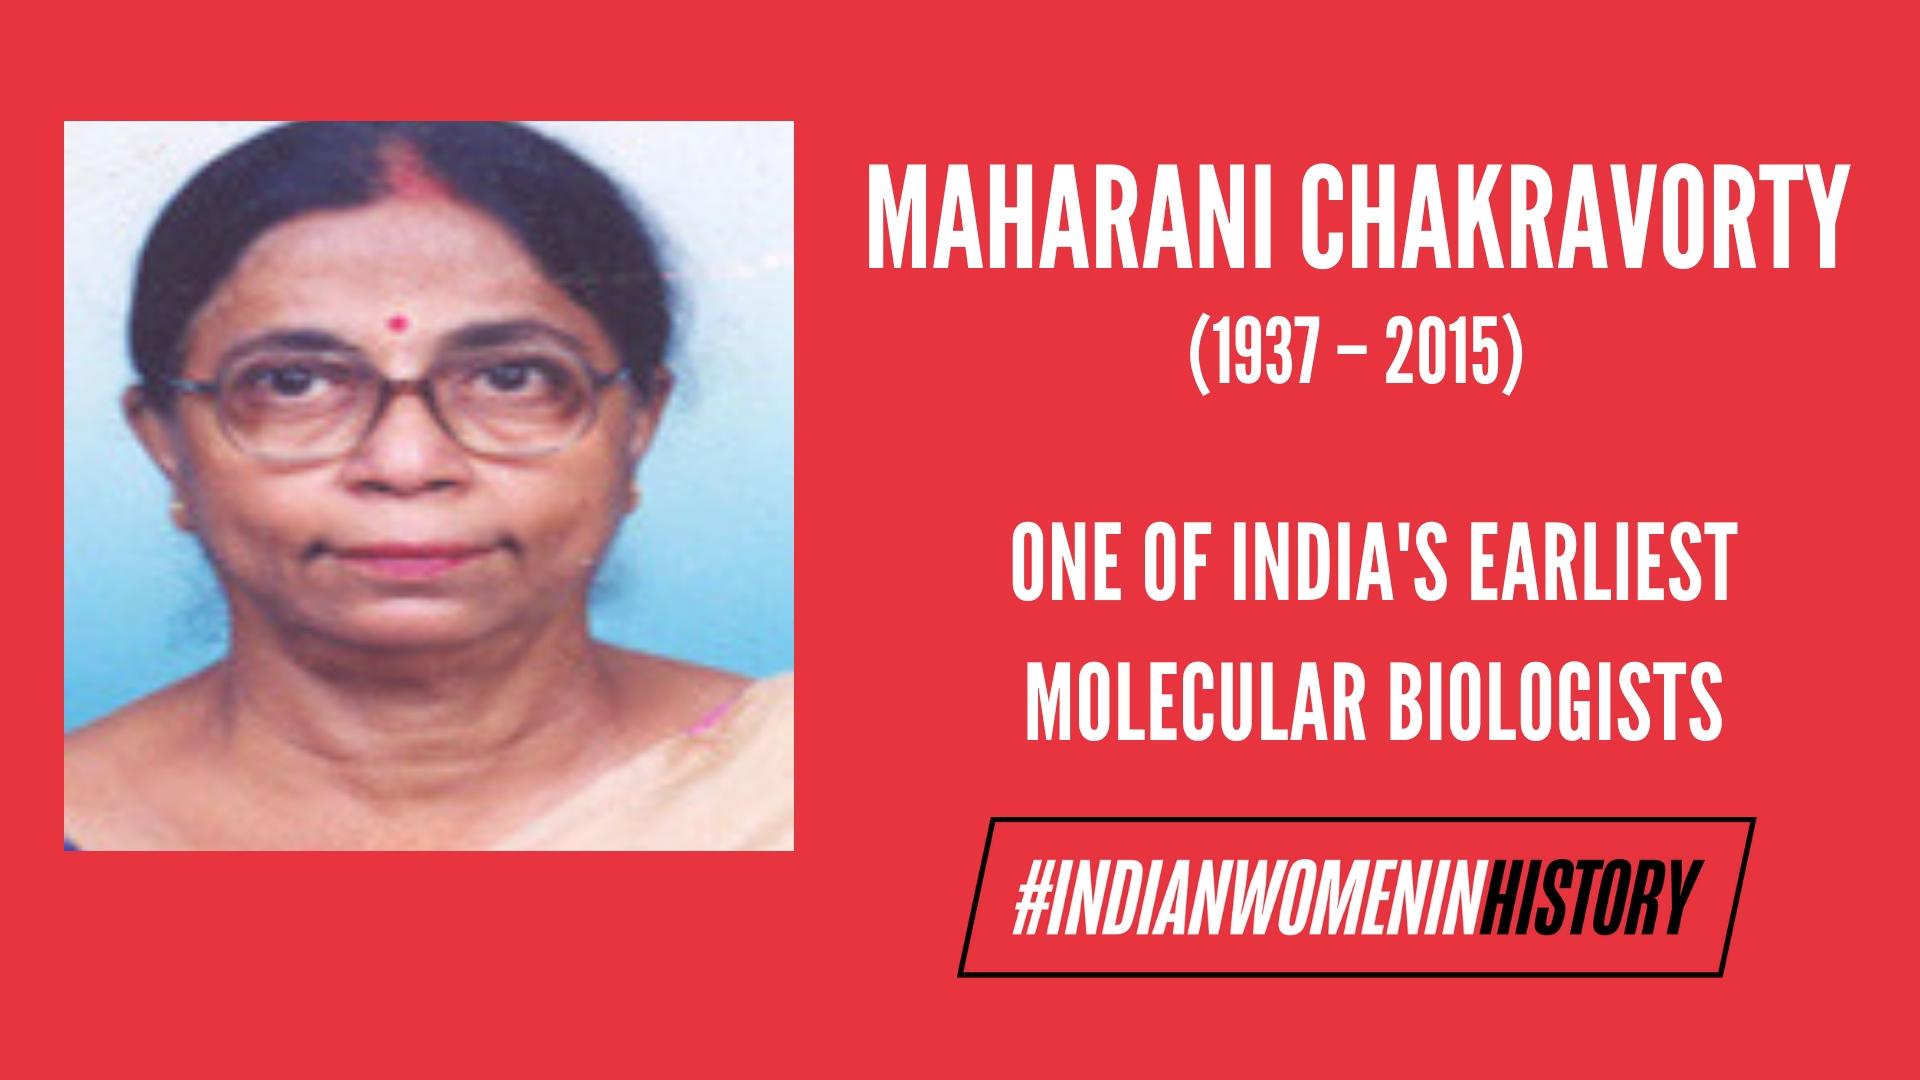 Dr. Maharani Chakravorty: One Of India's Earliest Molecular Biologists | #IndianWomenInHistory